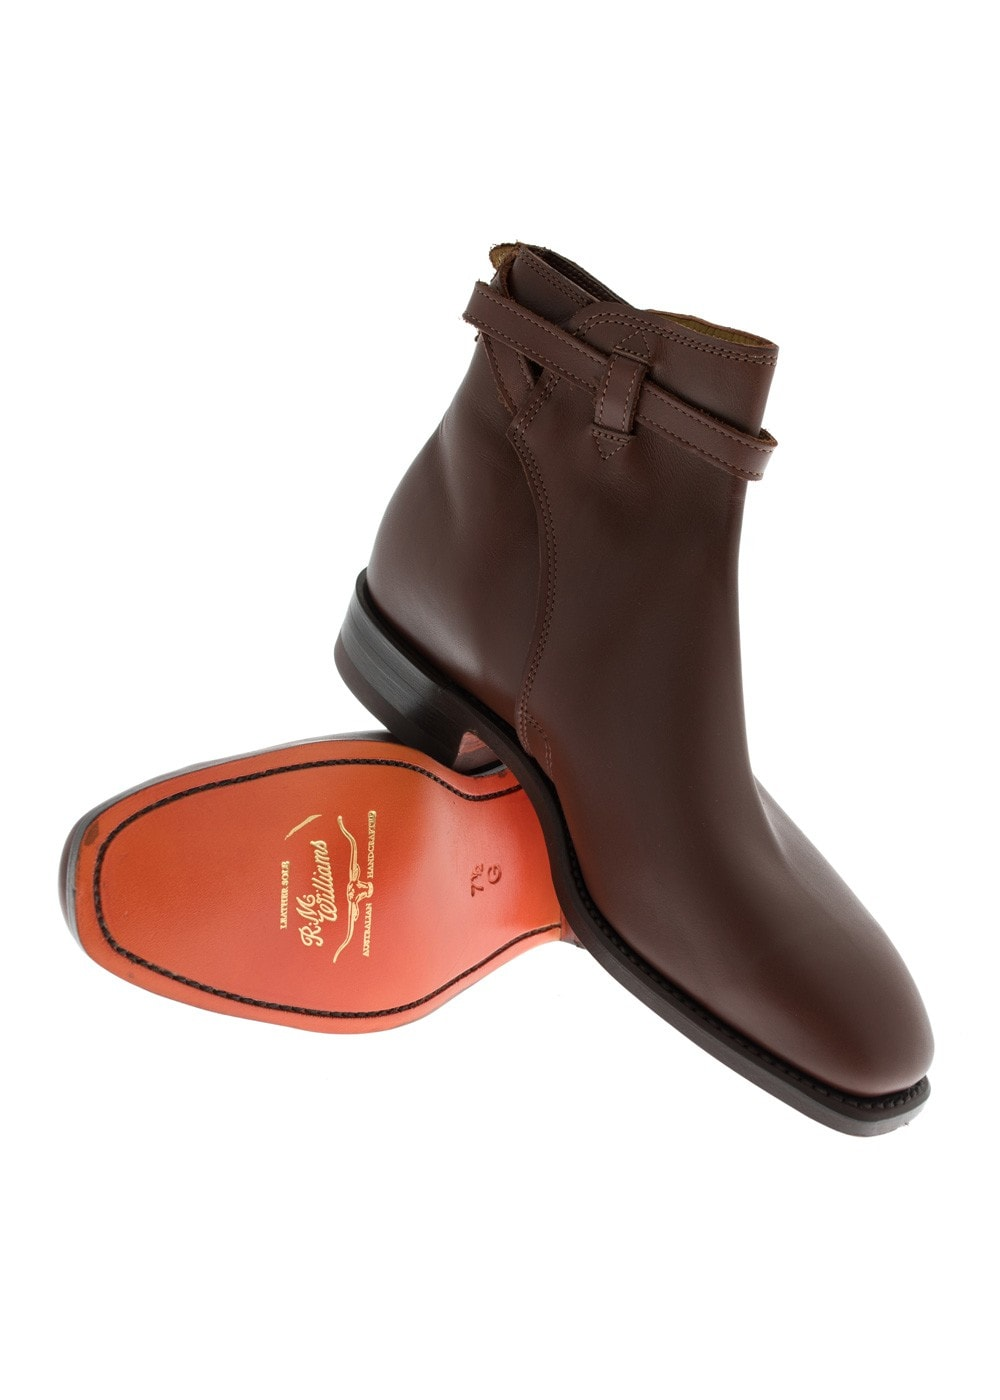 33a0a5e420e RM Williams Stockman Buckle Boots